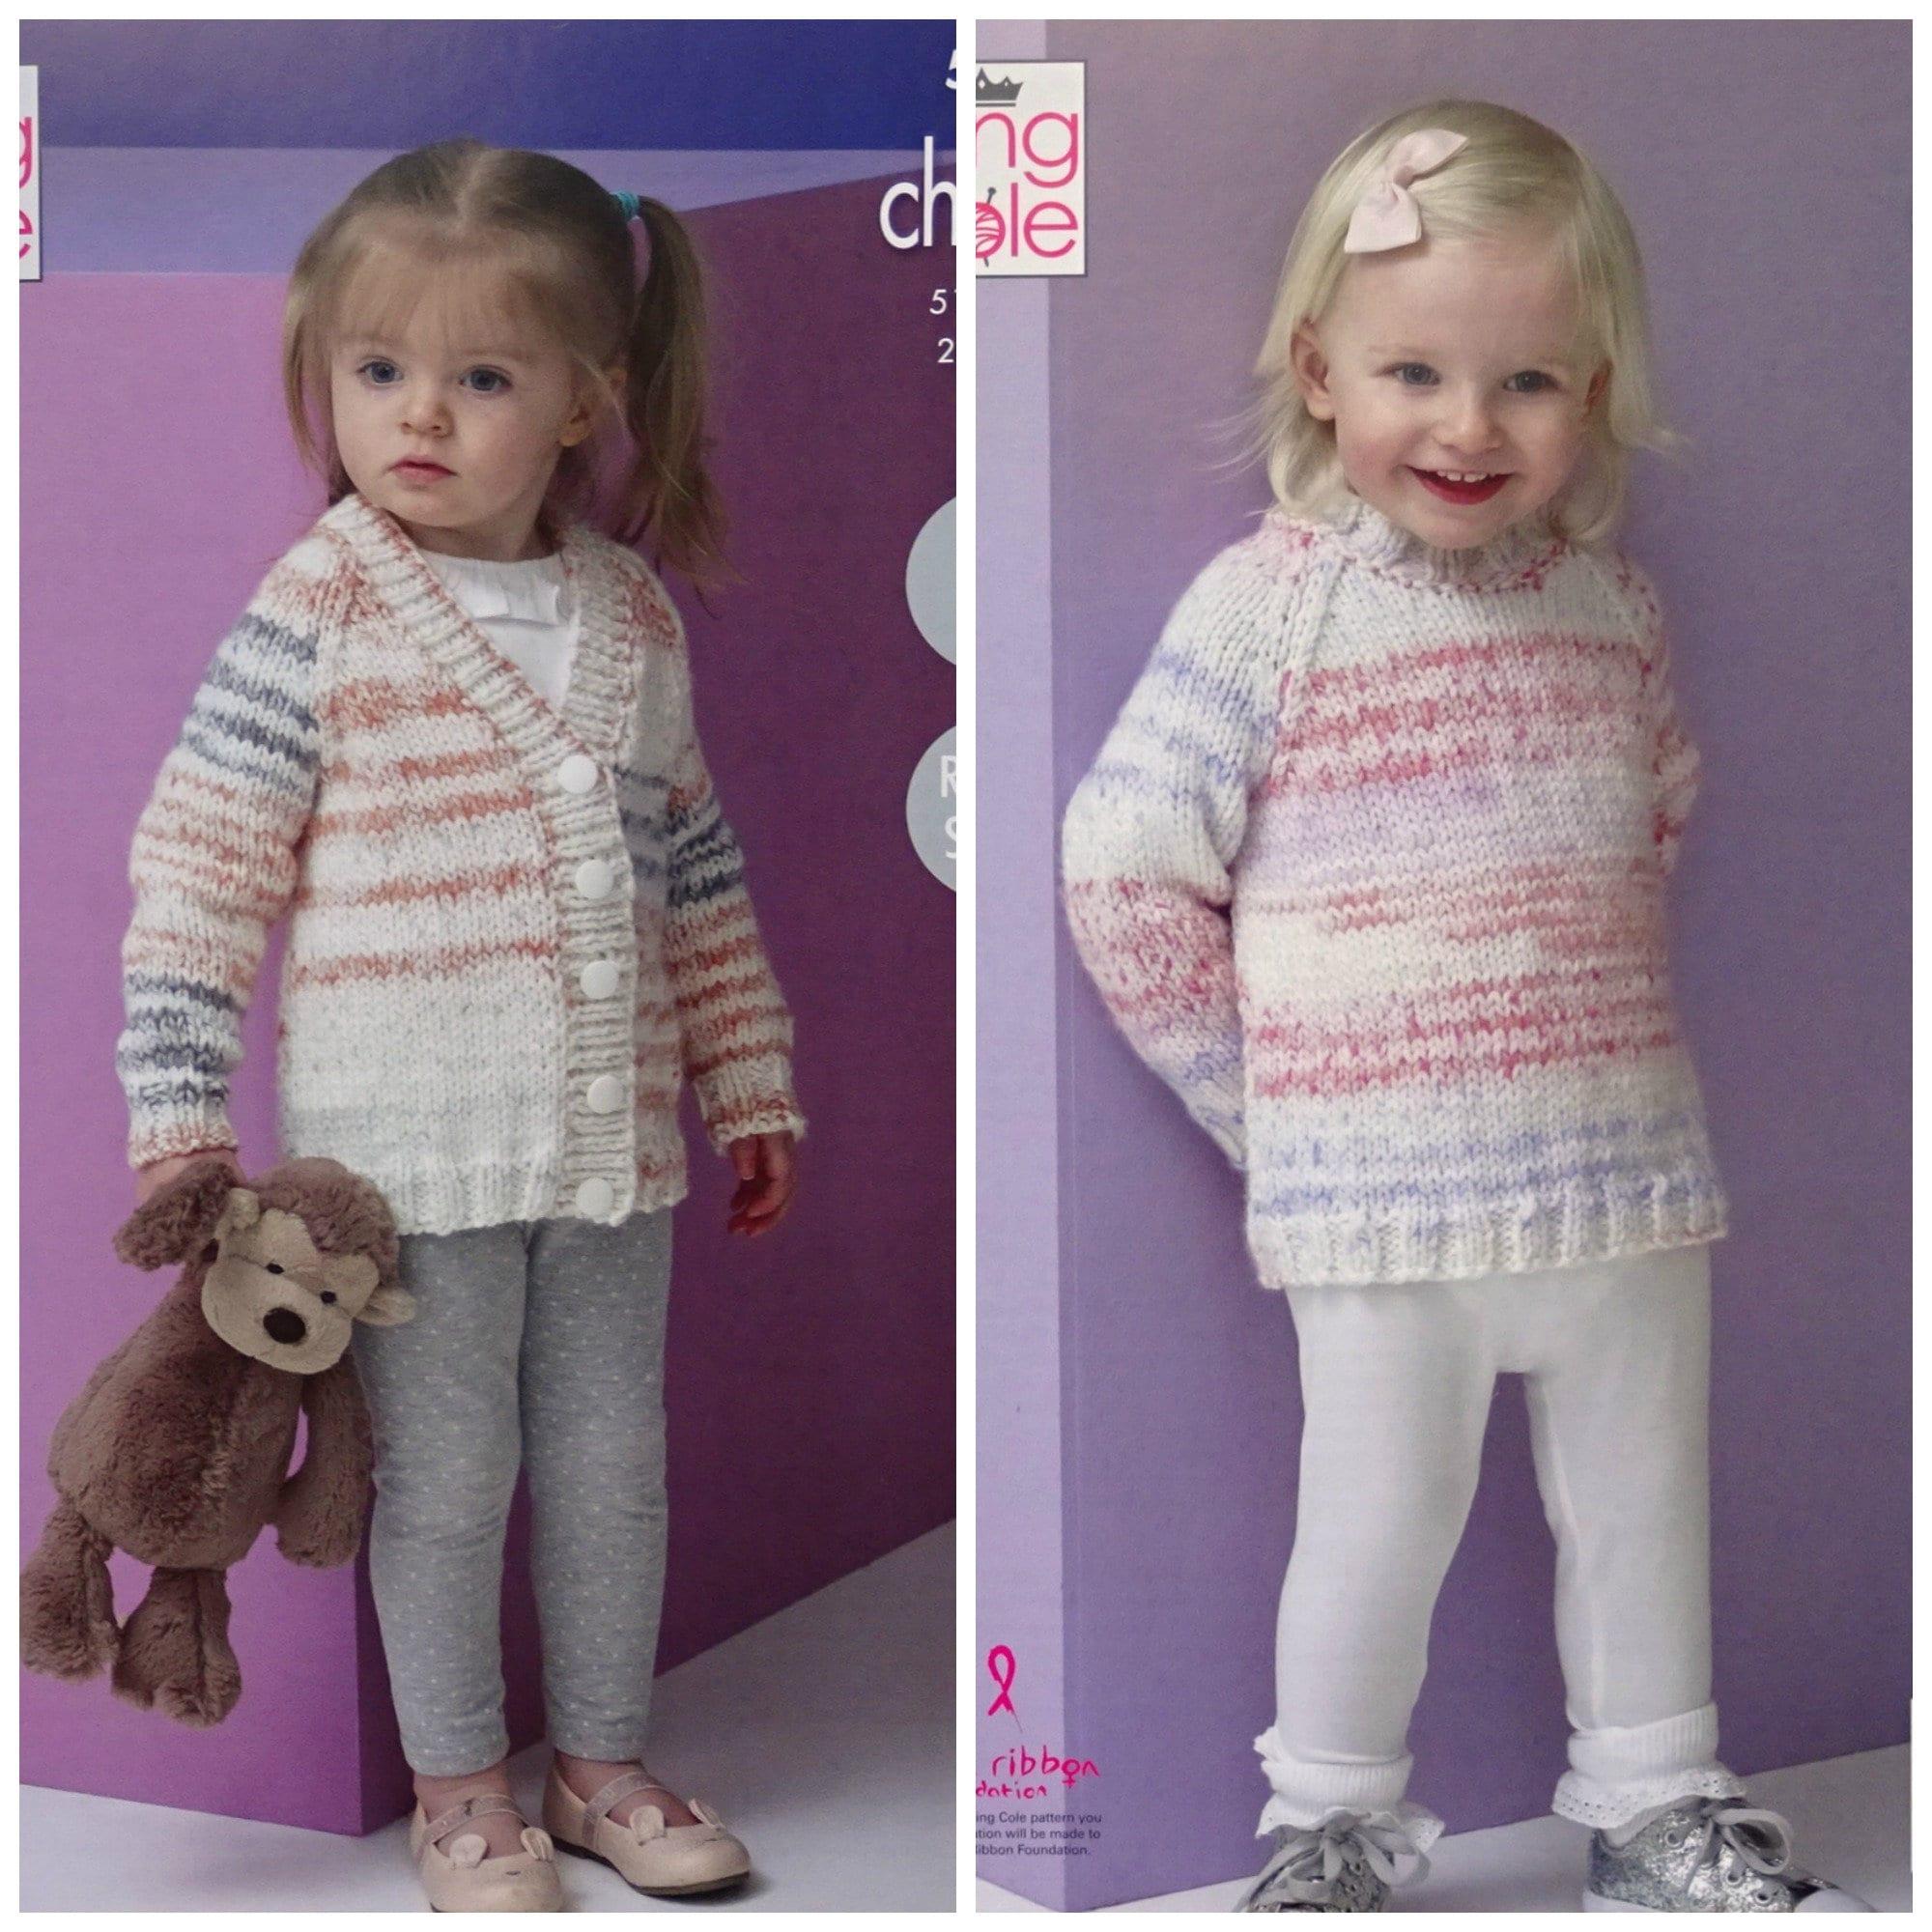 b9b7a30c5d94 Girls Knitting Pattern K5211 Childrens Easy Knit Long Sleeve Round ...